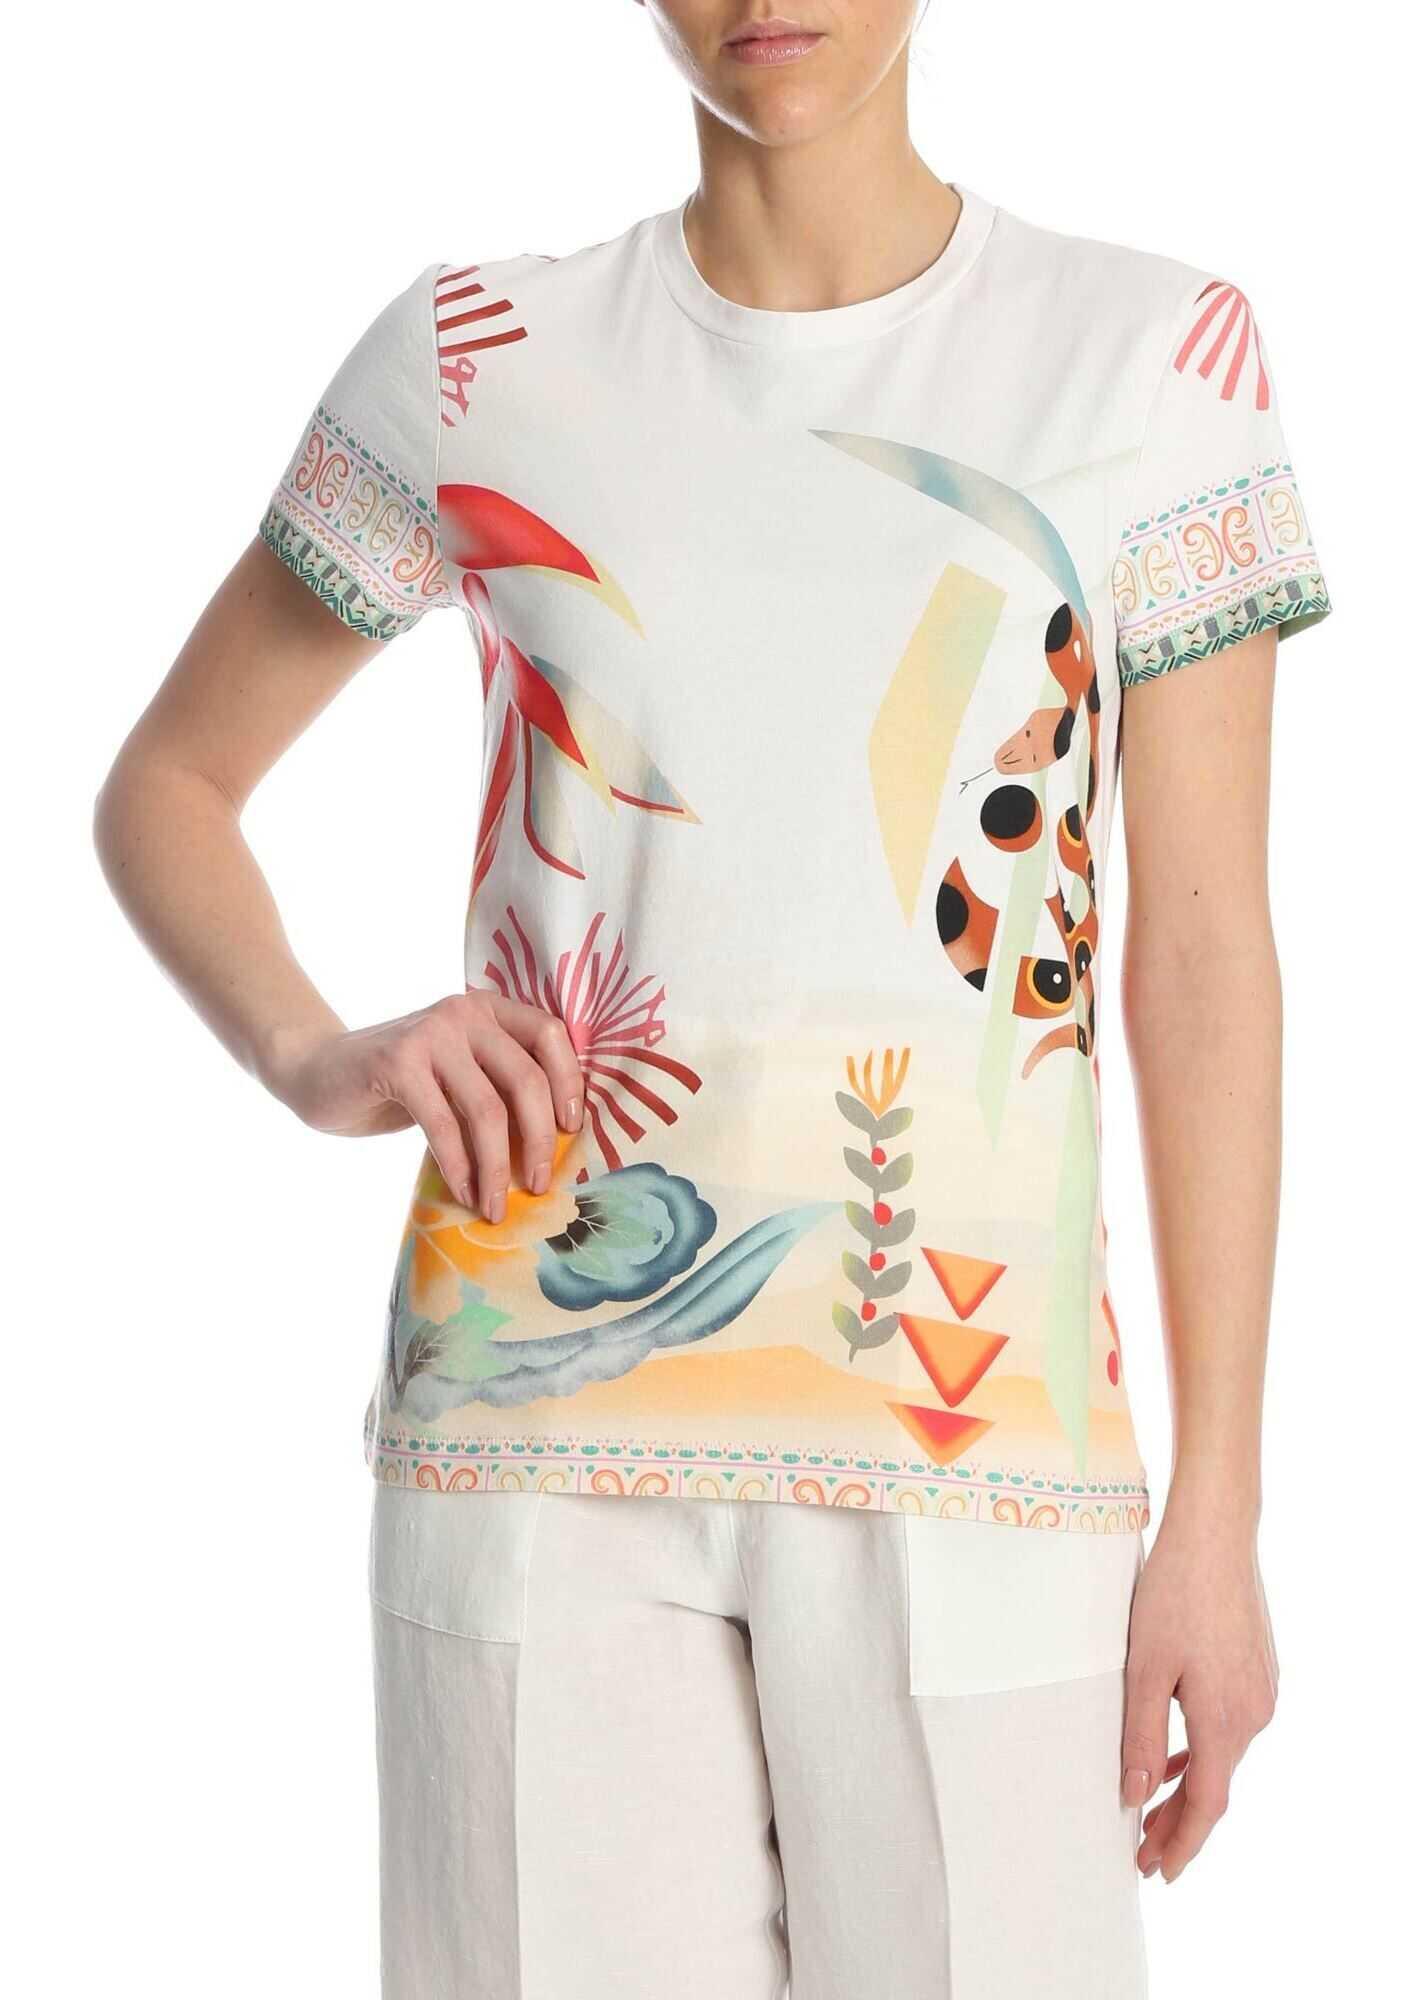 ETRO T-Shirt In Multicolor Pattern Multi